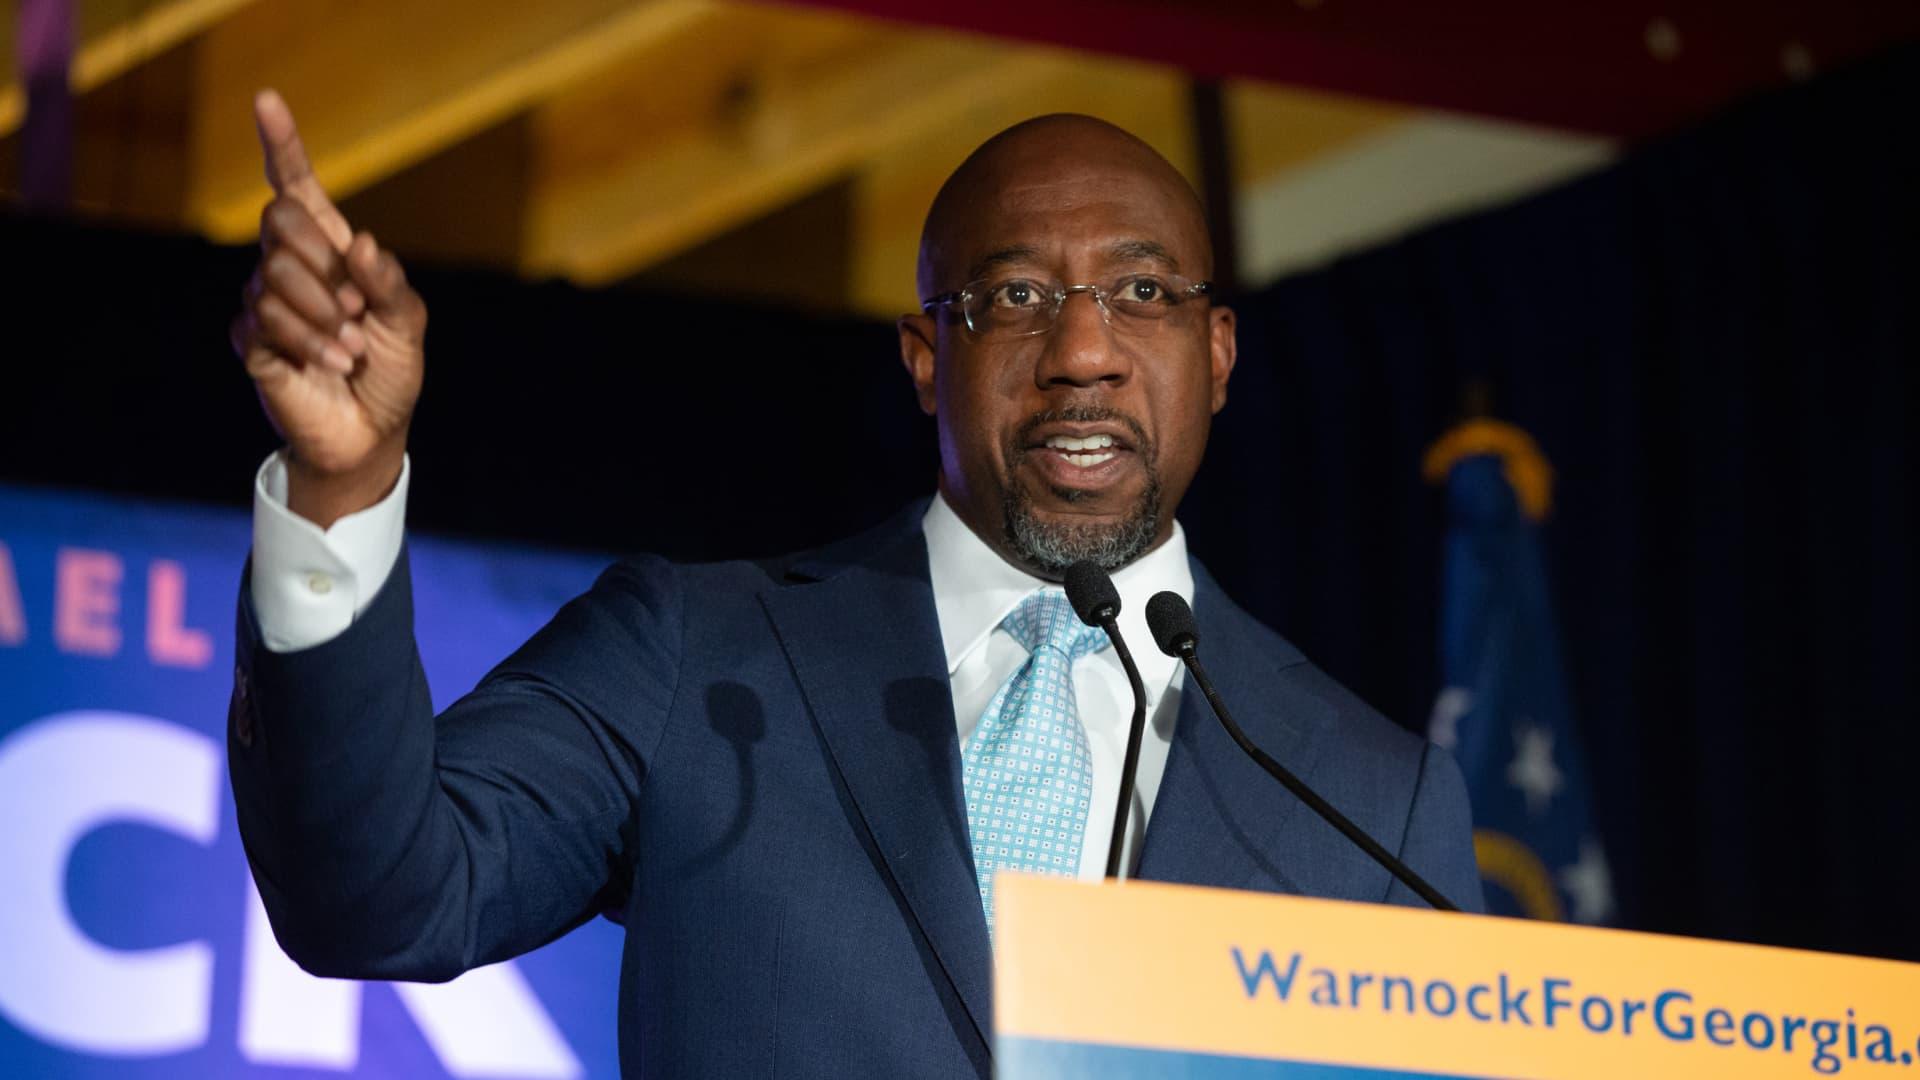 Democratic U.S. Senate candidate Rev. Raphael Warnock speaks during an Election Night event on November 3, 2020 in Atlanta, Georgia.